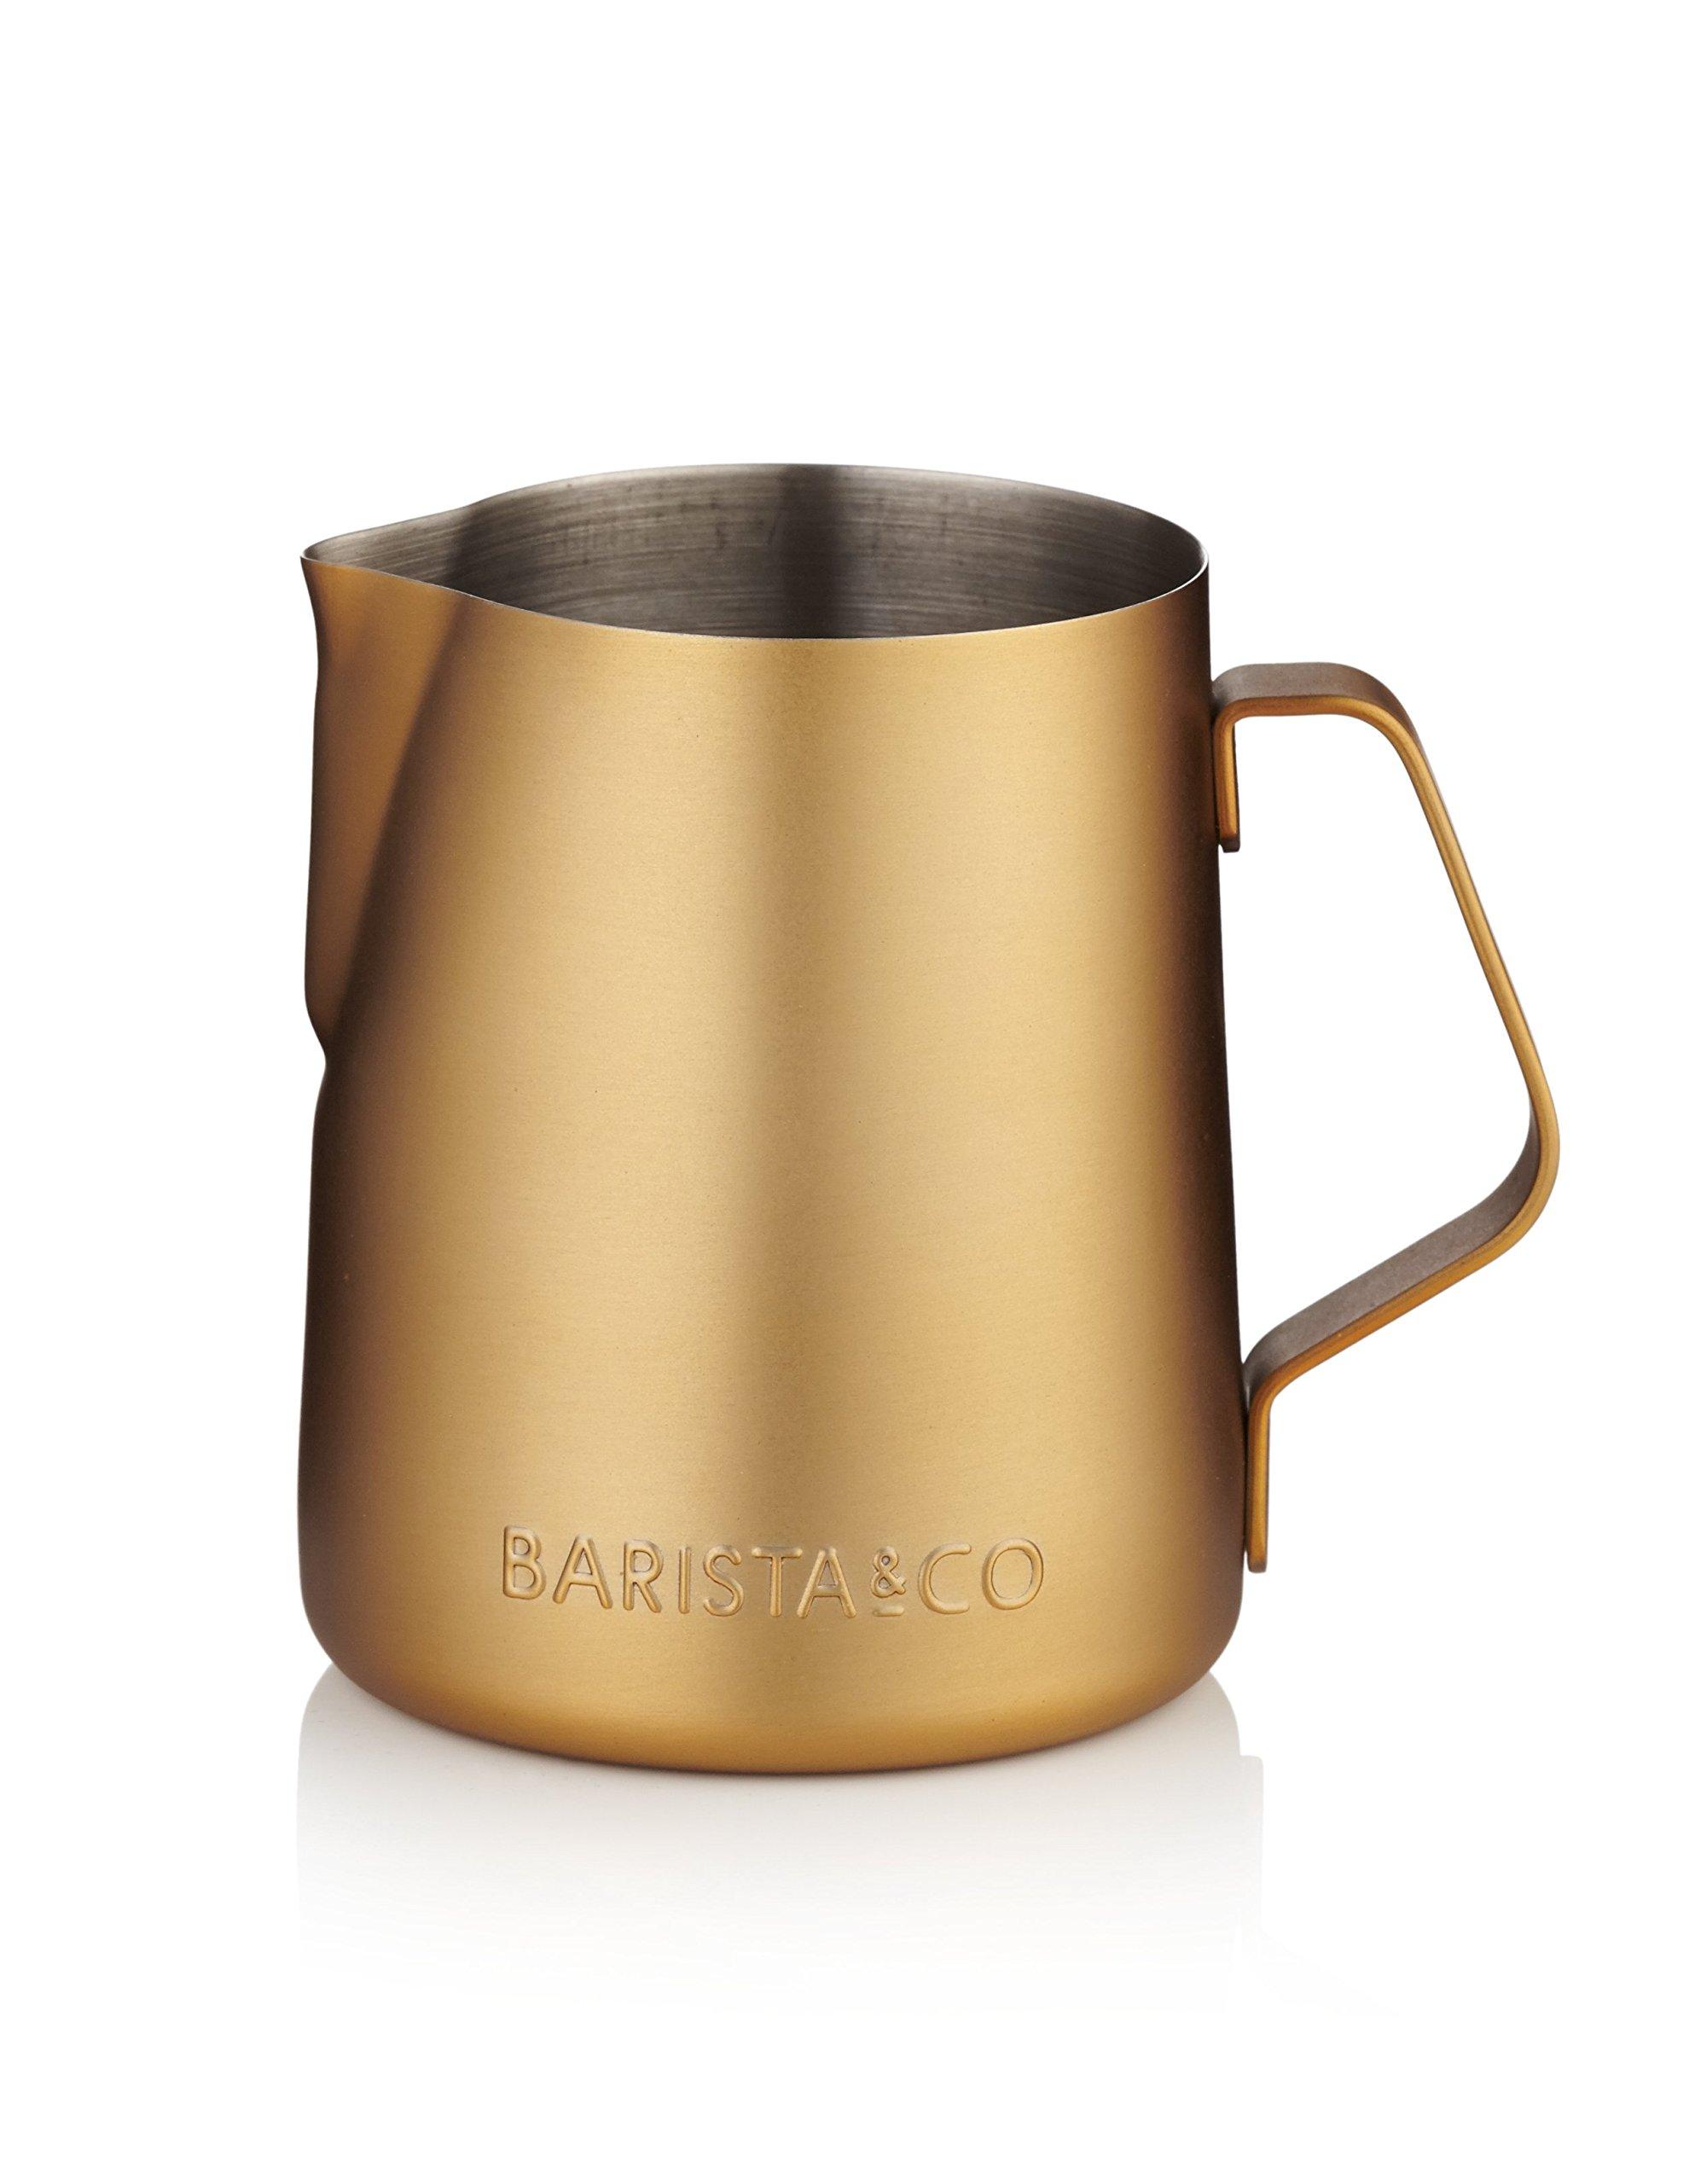 Barista & Co Milk Jug, Midnight Gold by Barista (Image #2)